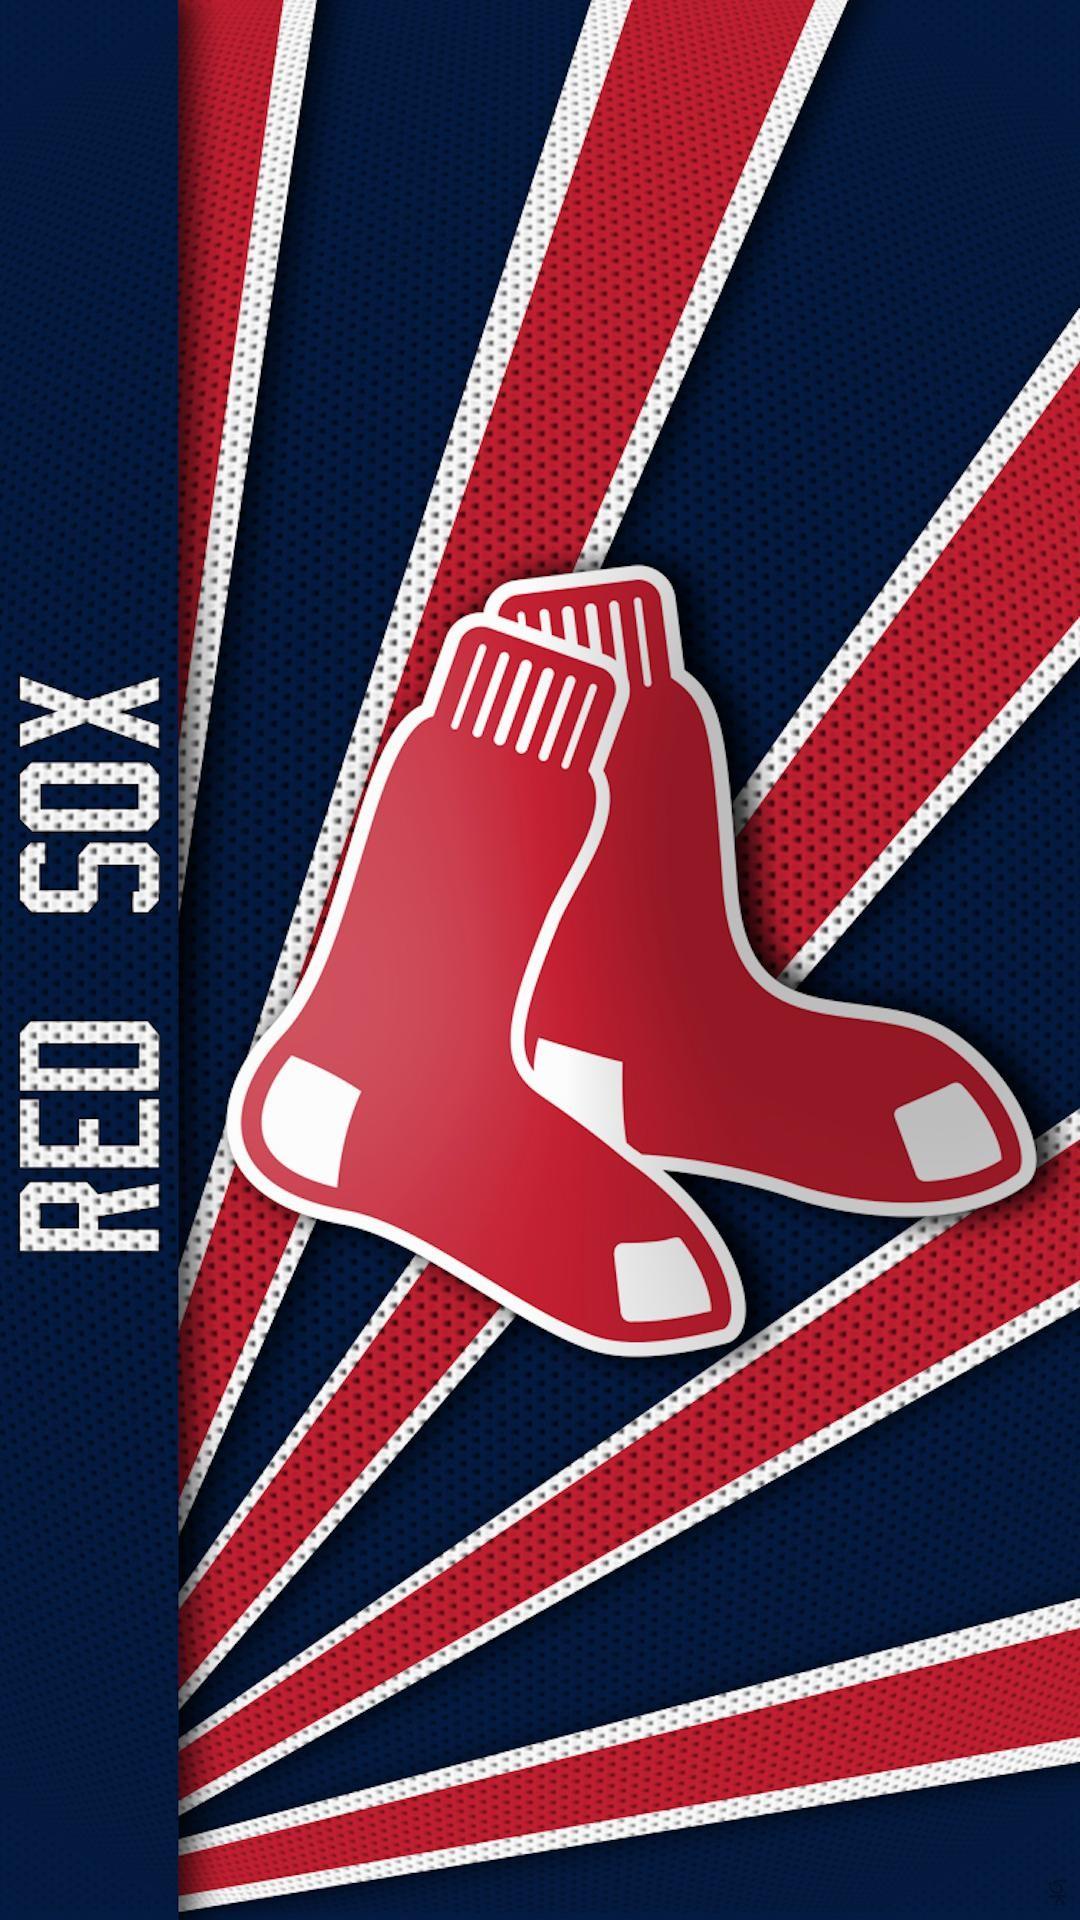 wallpaper.wiki-Boston-Red-Sox-iPhone-Desktop-Wallpaper-